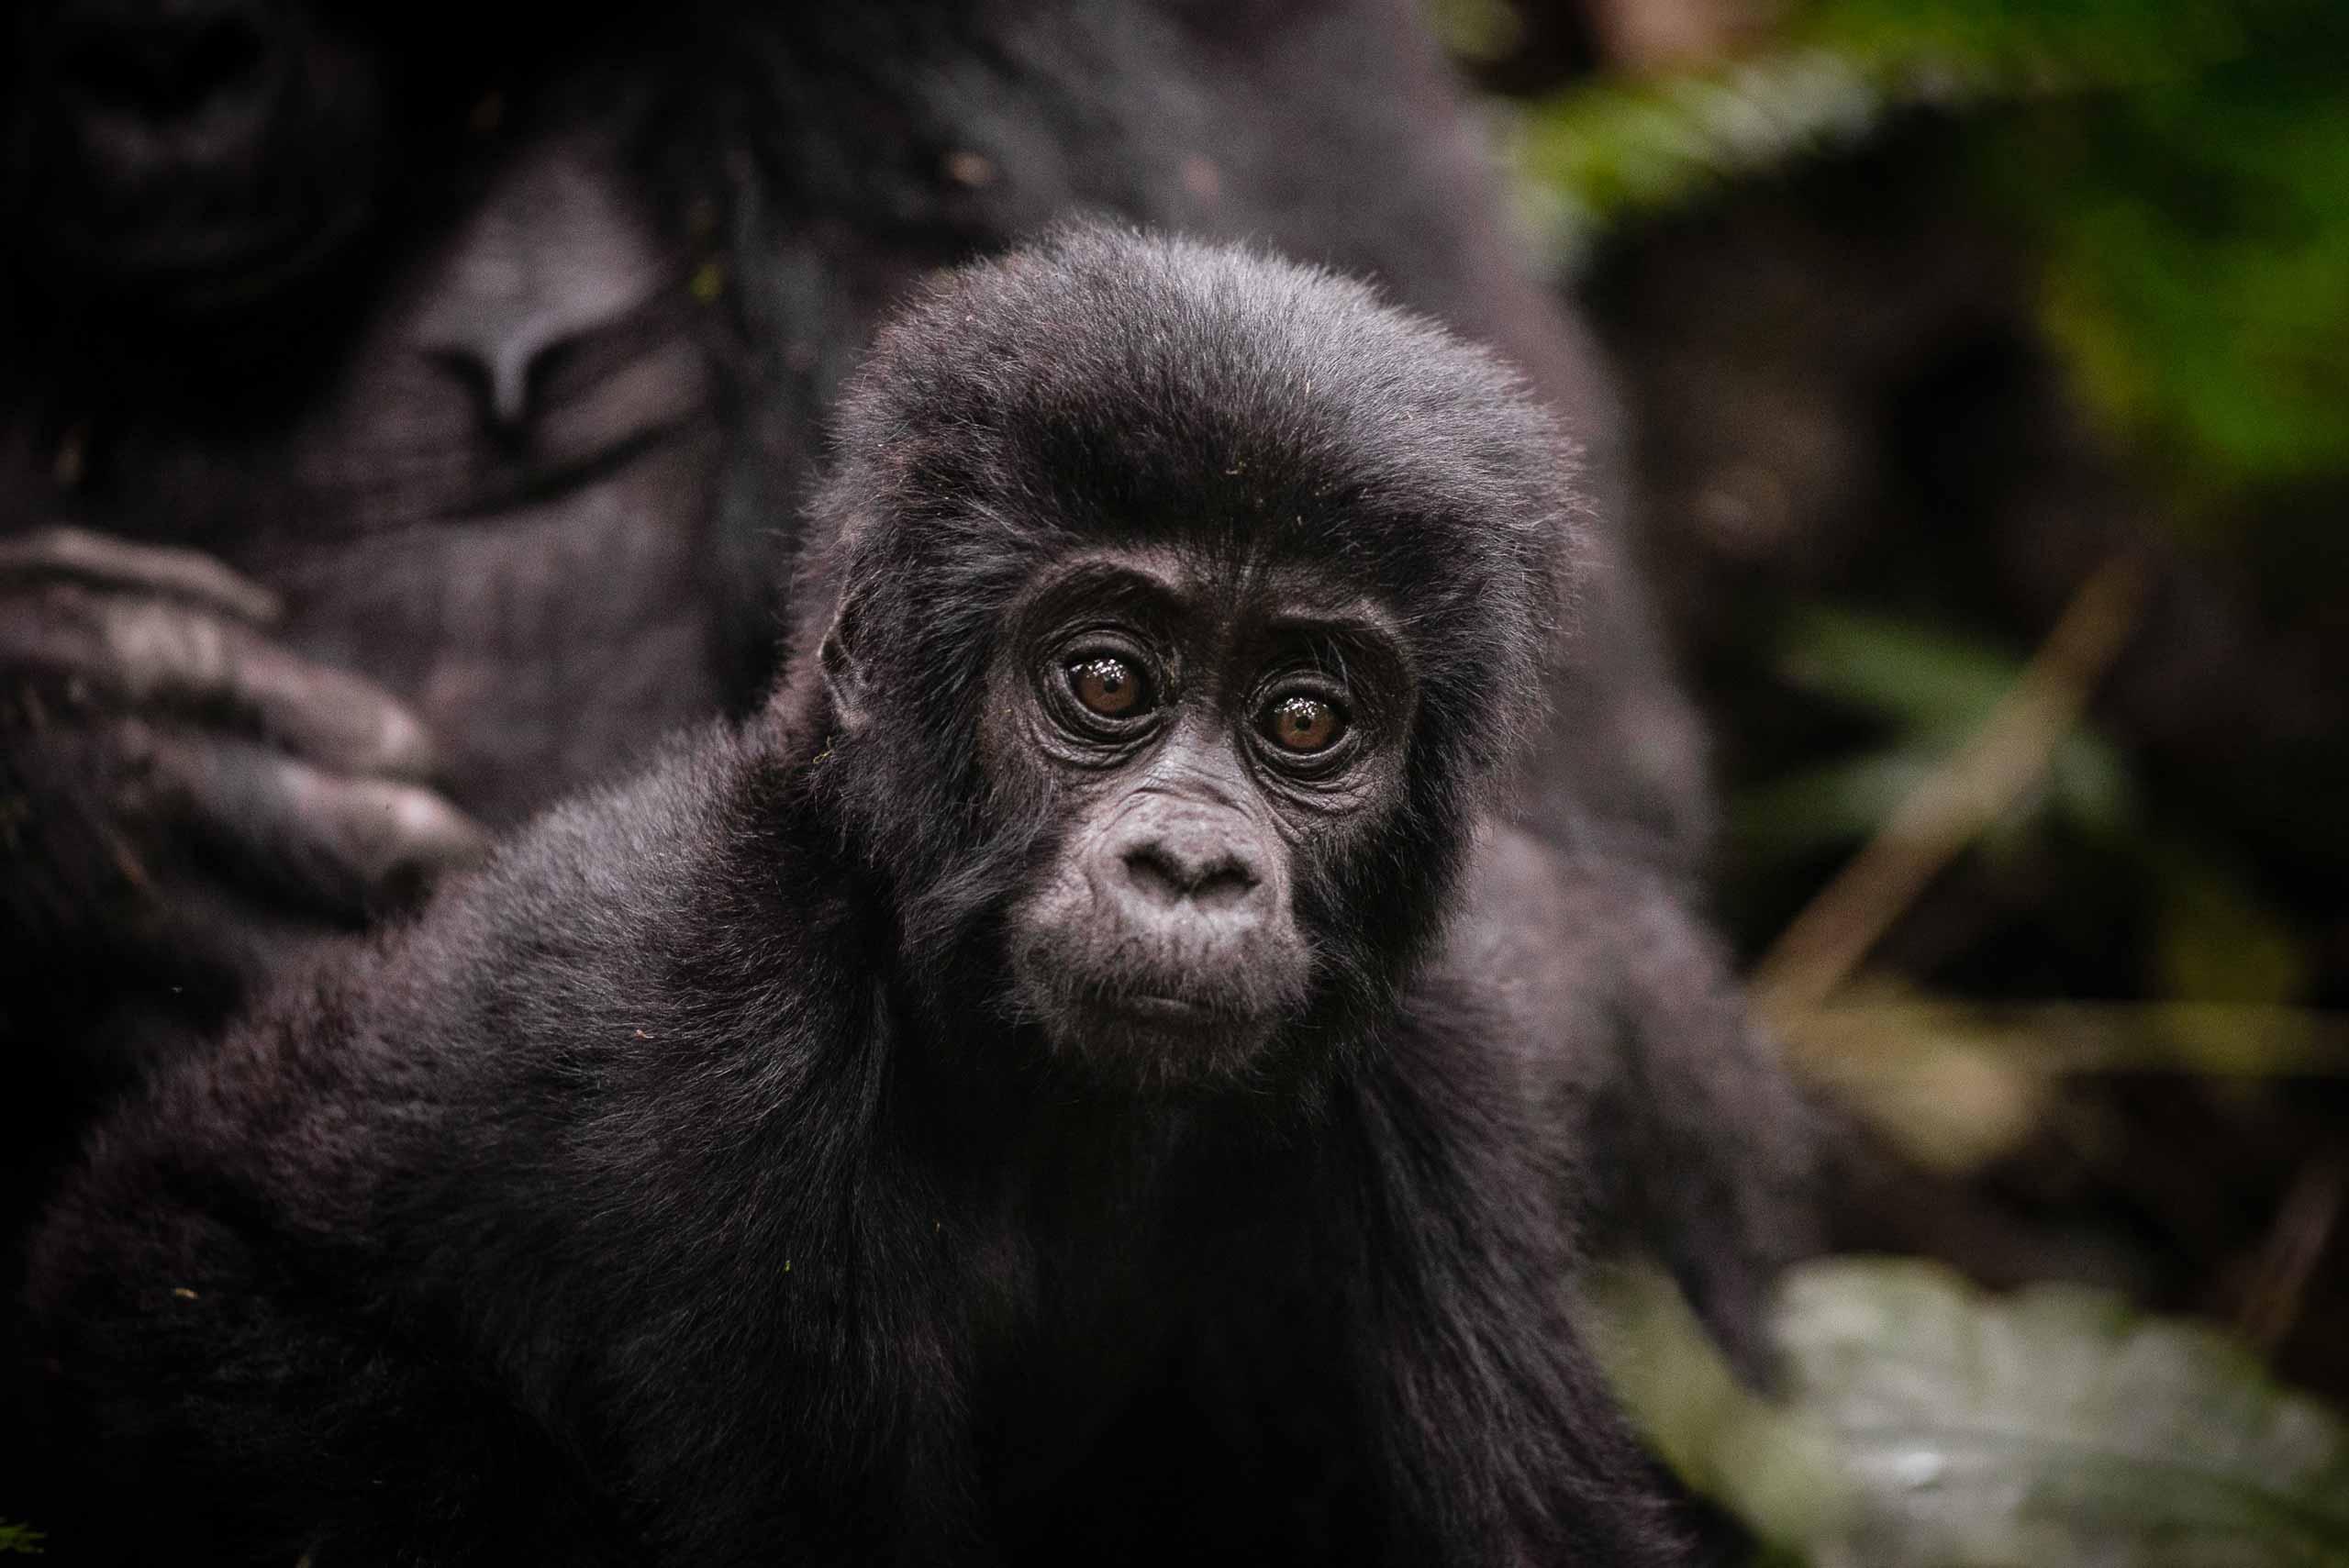 enkosi-africa-safari-uganda-bwindi-impenetrable-gorilla-forest-camp-sanctuary-baby-gorilla